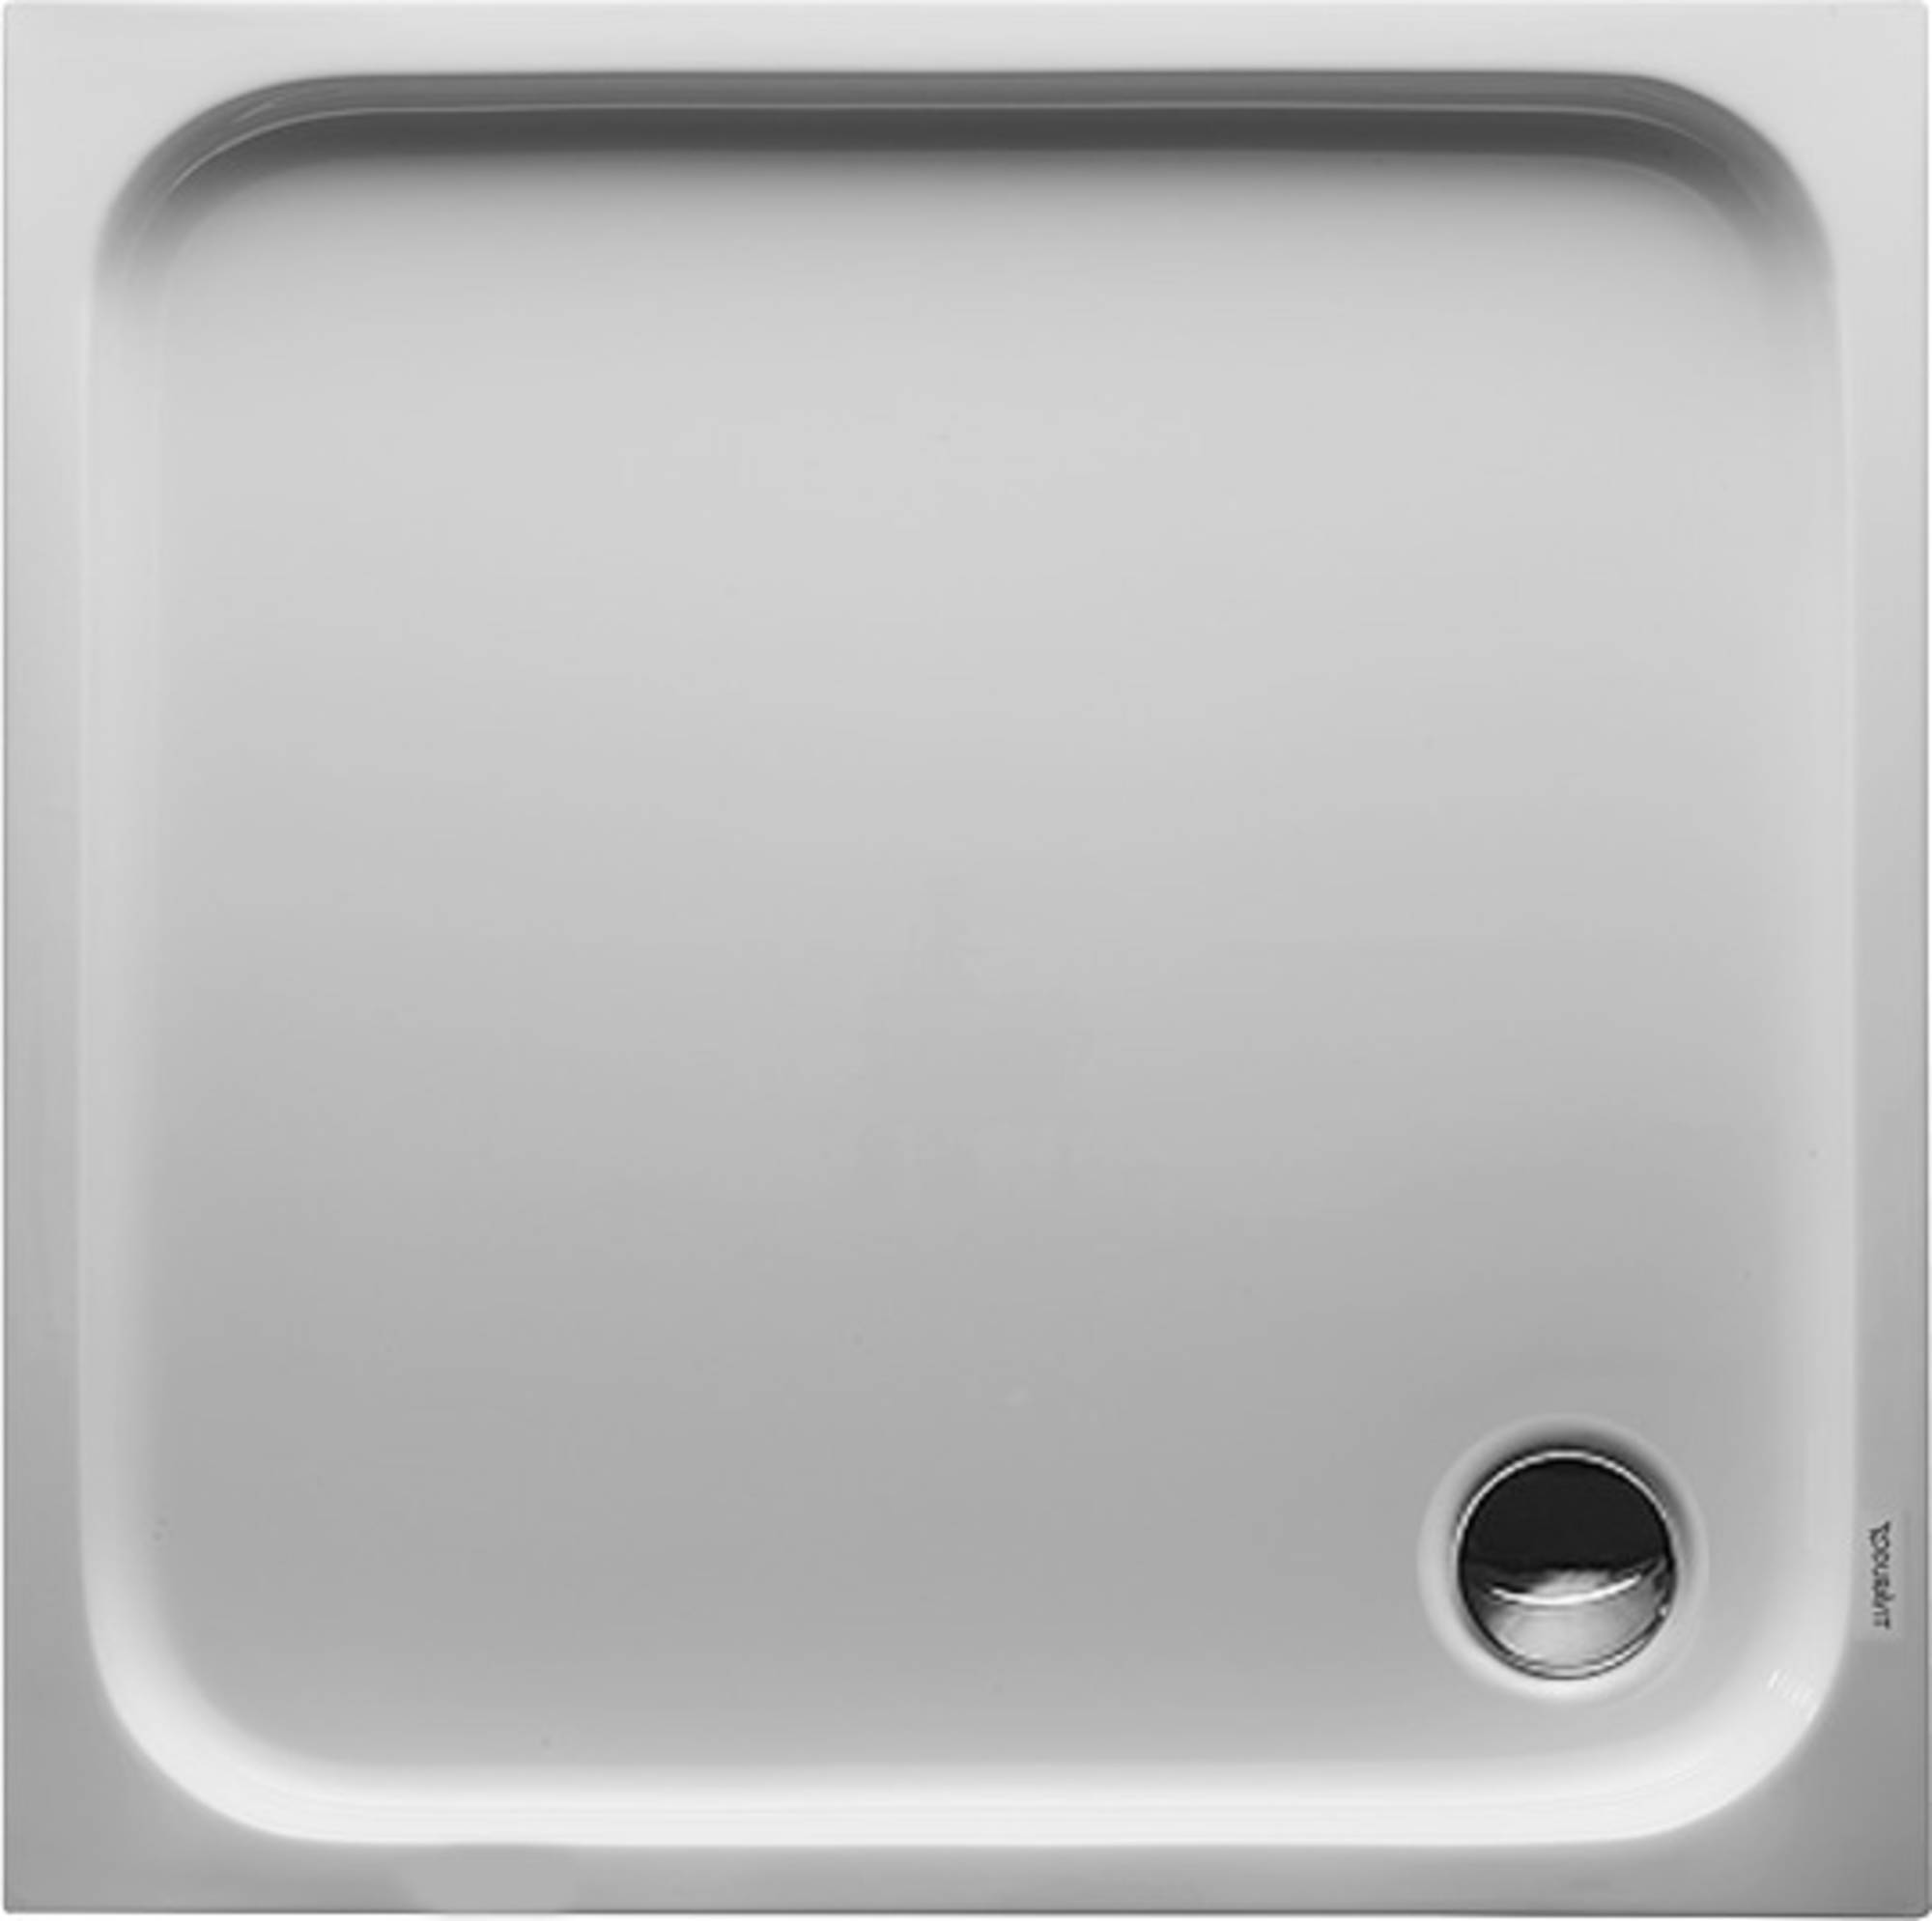 Duravit D-Code kunststof douchebak acryl vierkant z. paneel 90x90cm m. afvoergat Ø90mm wit